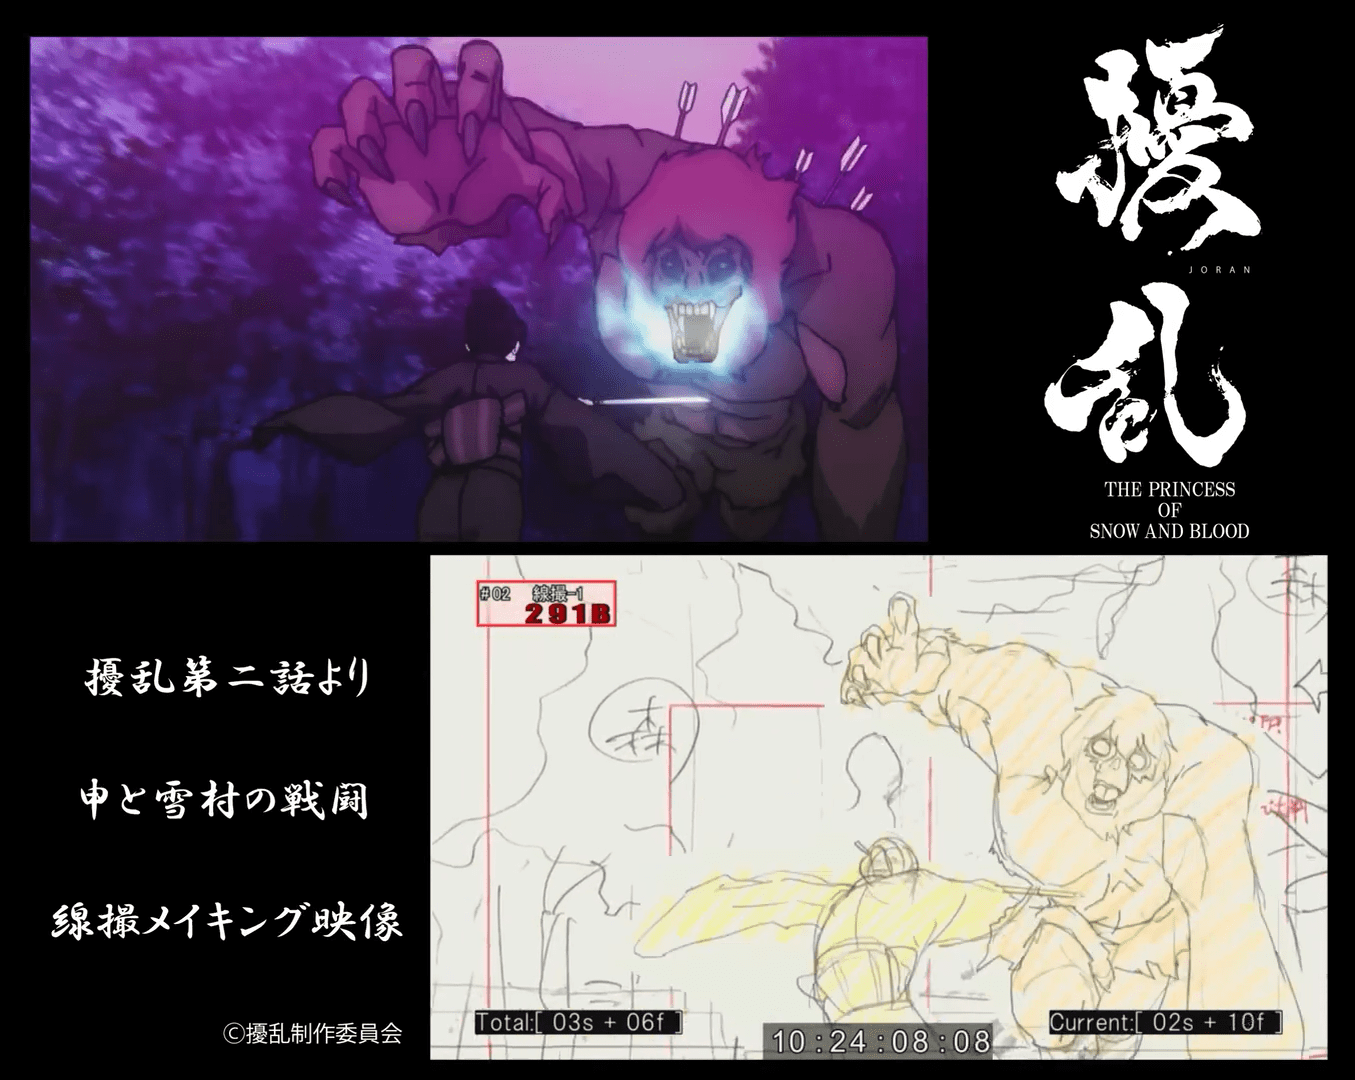 TV动画「扰乱 THE PRINCESS OF SNOW AND BLOOD」第二话线摄动画公开